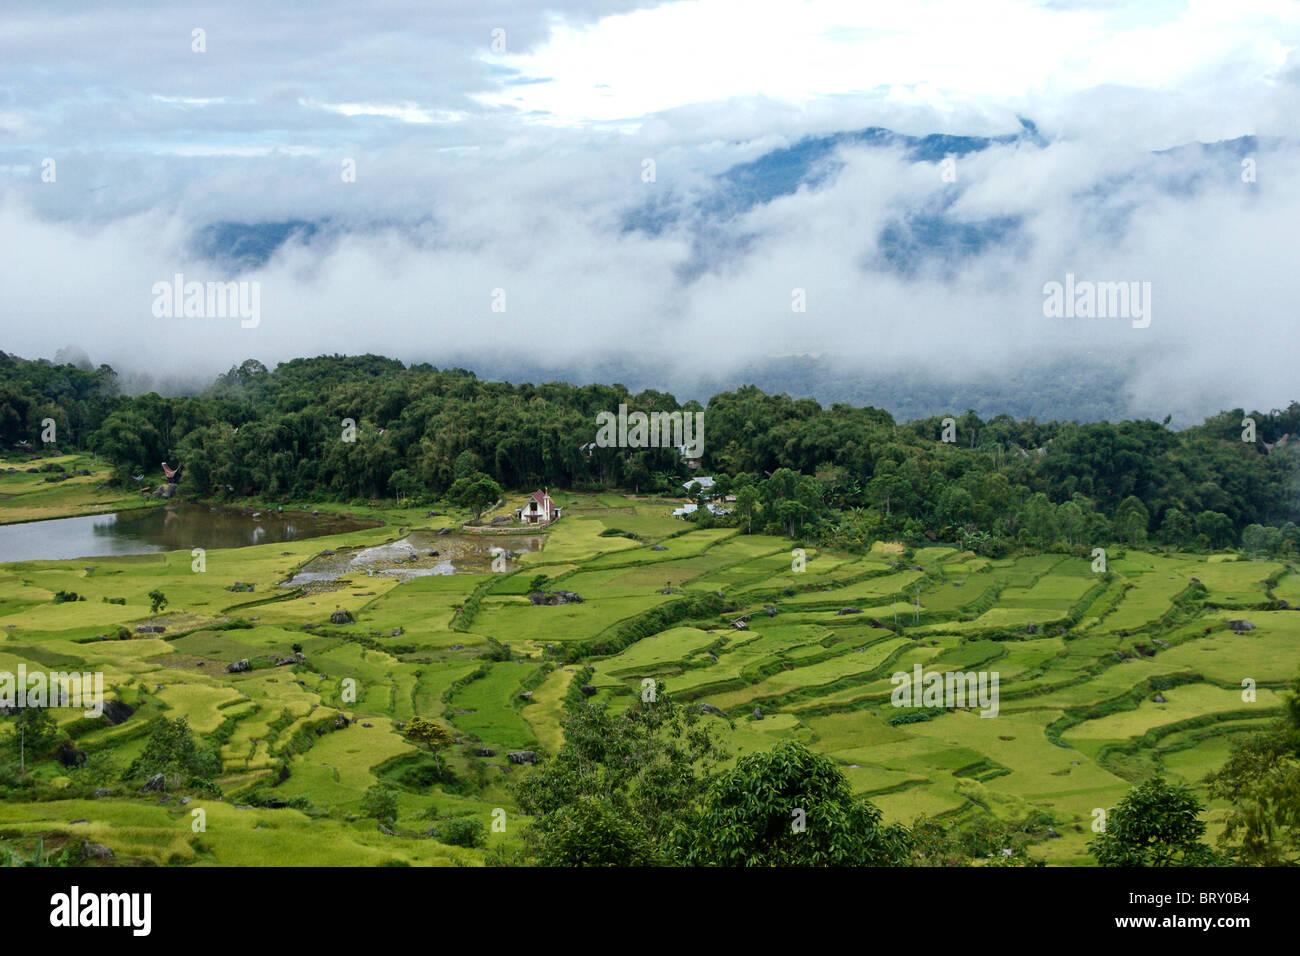 Rice terraces at Batutumonga, Tana Toraja, South Sulawesi, Indonesia - Stock Image